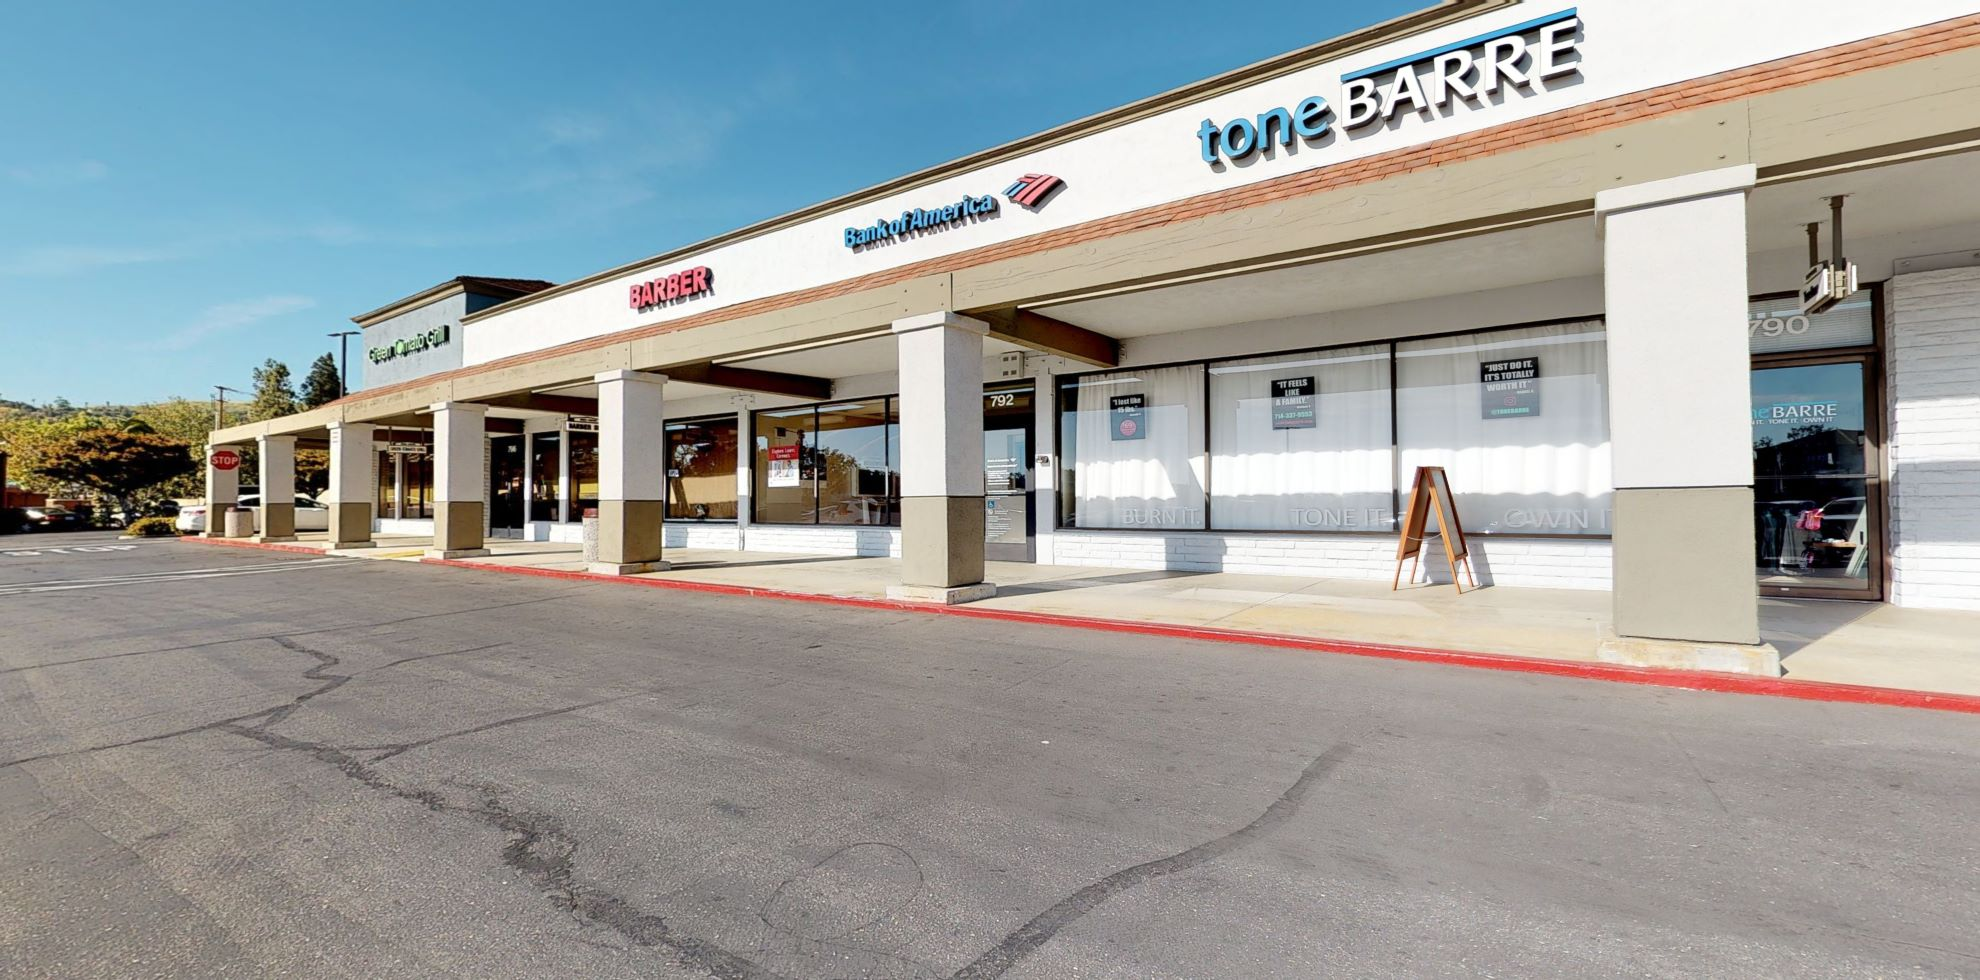 Bank of America Advanced Center with walk-up ATM   792 N Brea Blvd, Brea, CA 92821